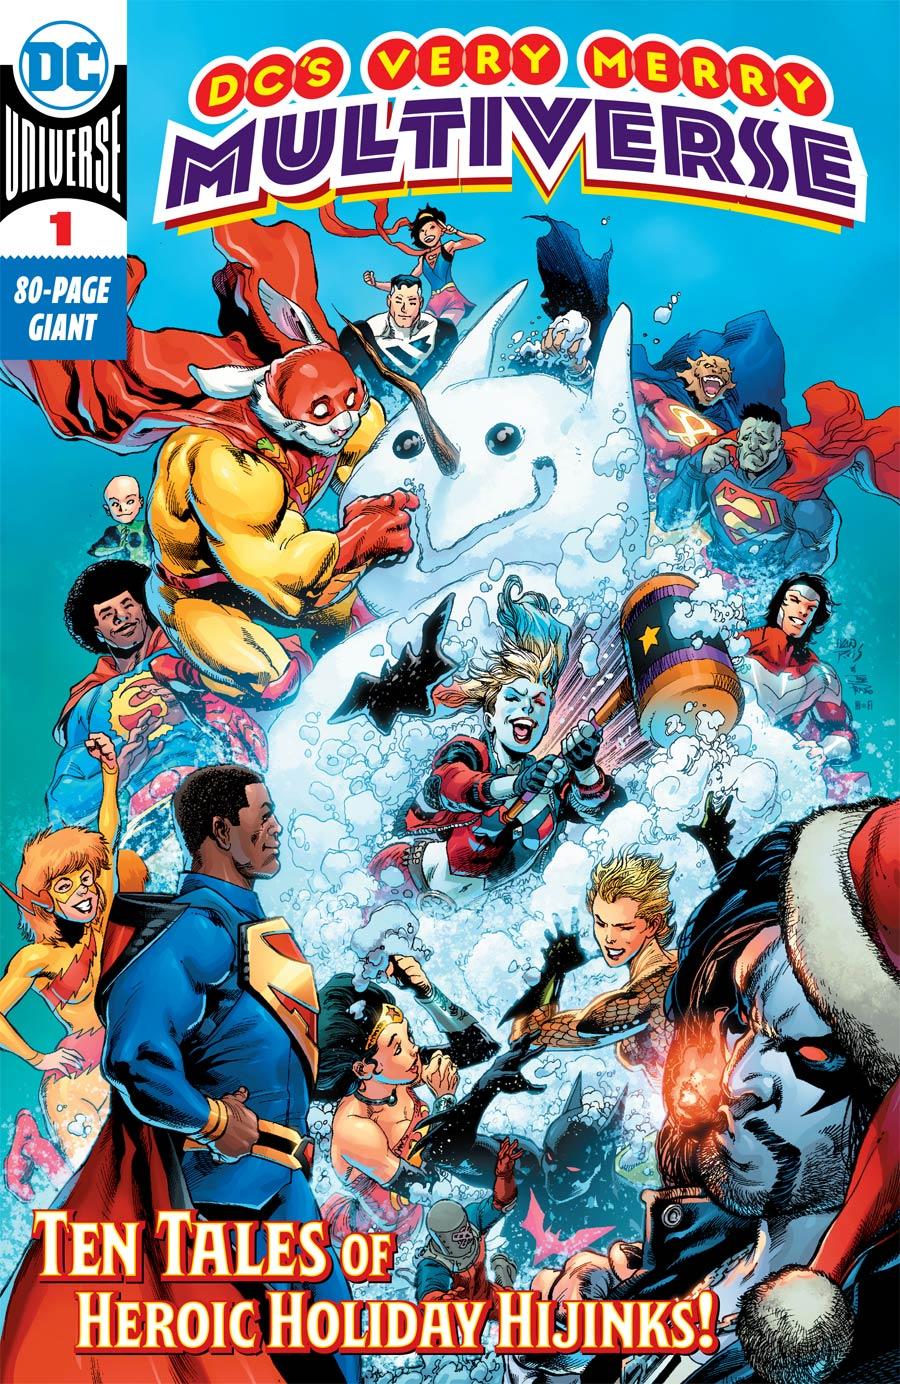 DC's Very Merry Multiverse #1